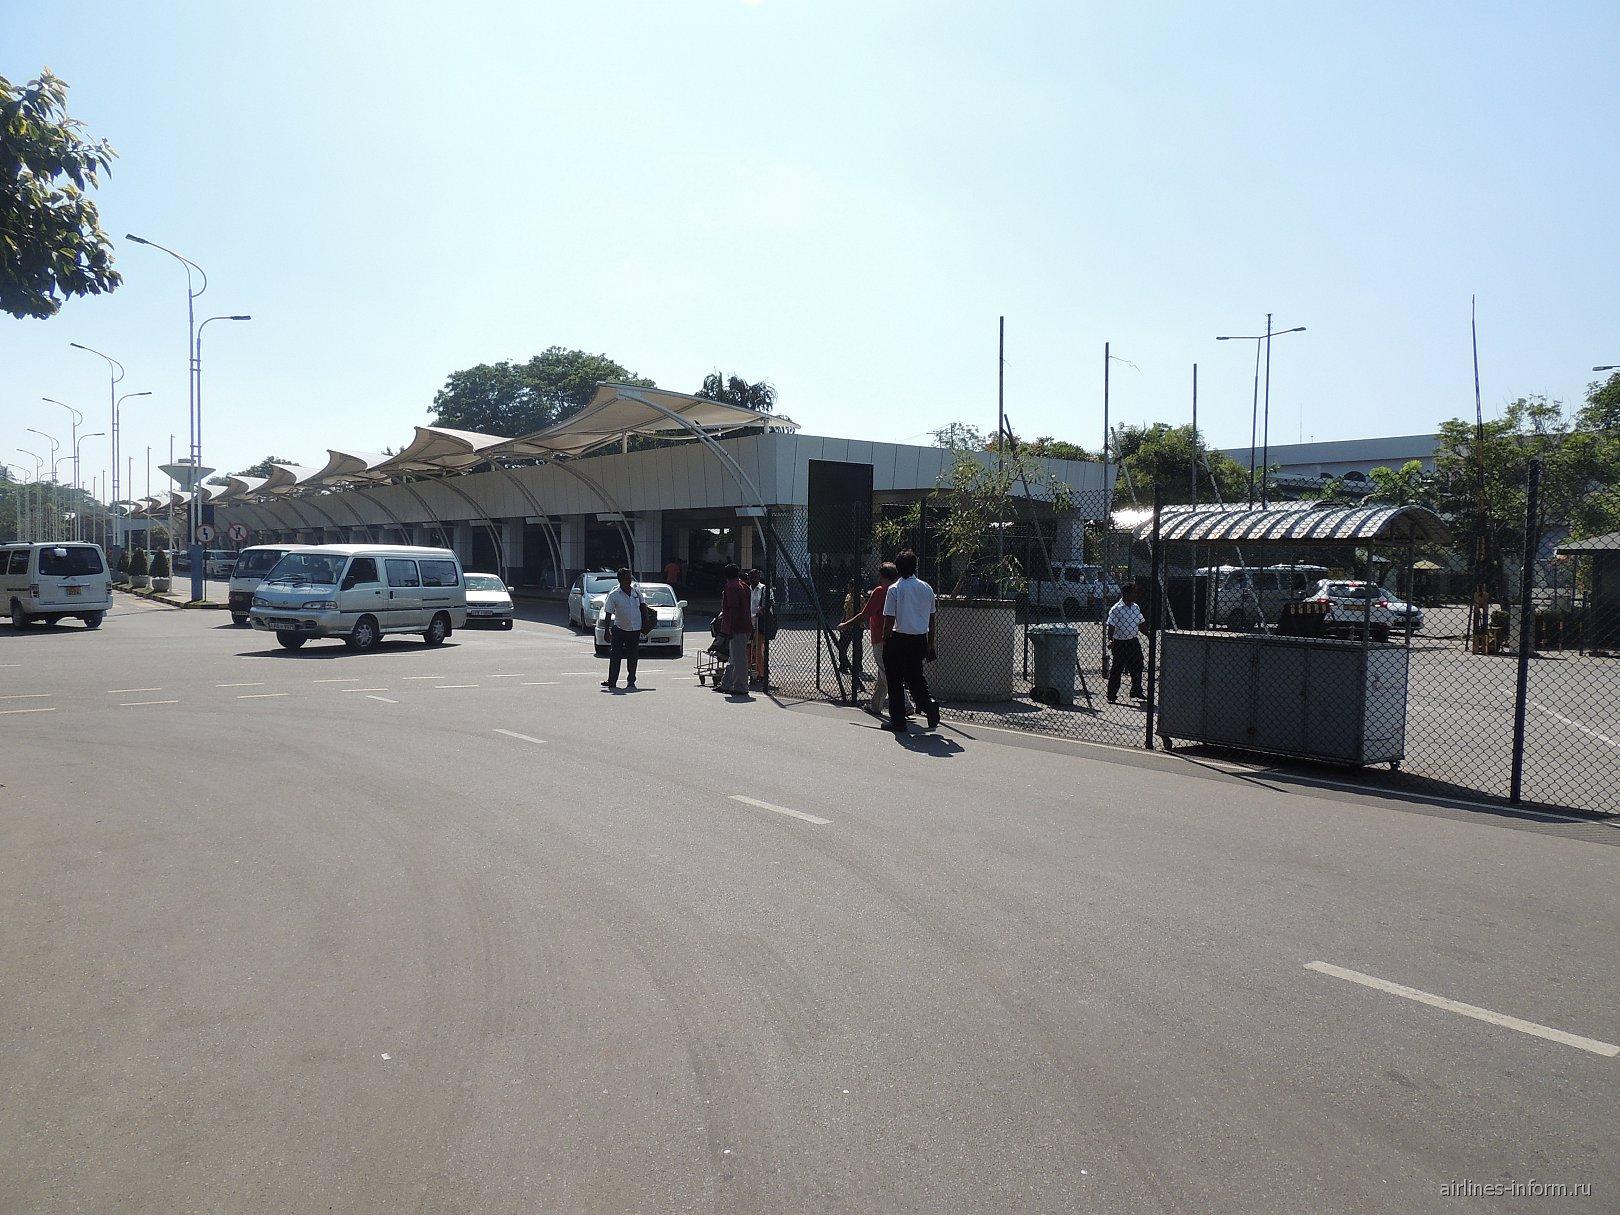 Пассажирский терминад аэропорта Коломбо Бандаранайке